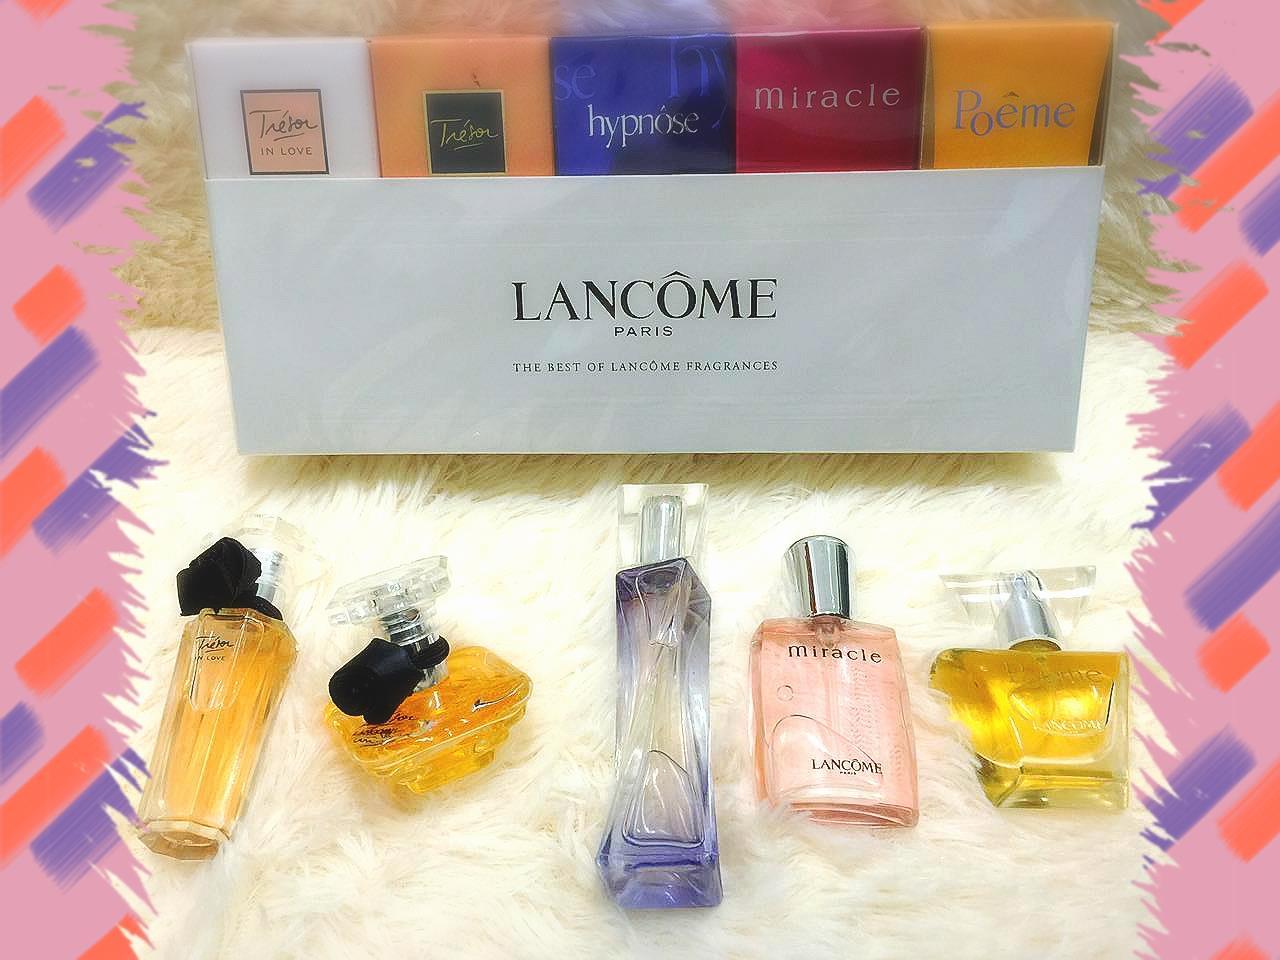 Lancôme Mini Fragrance Gift Set for Women uploaded by Suzie M.